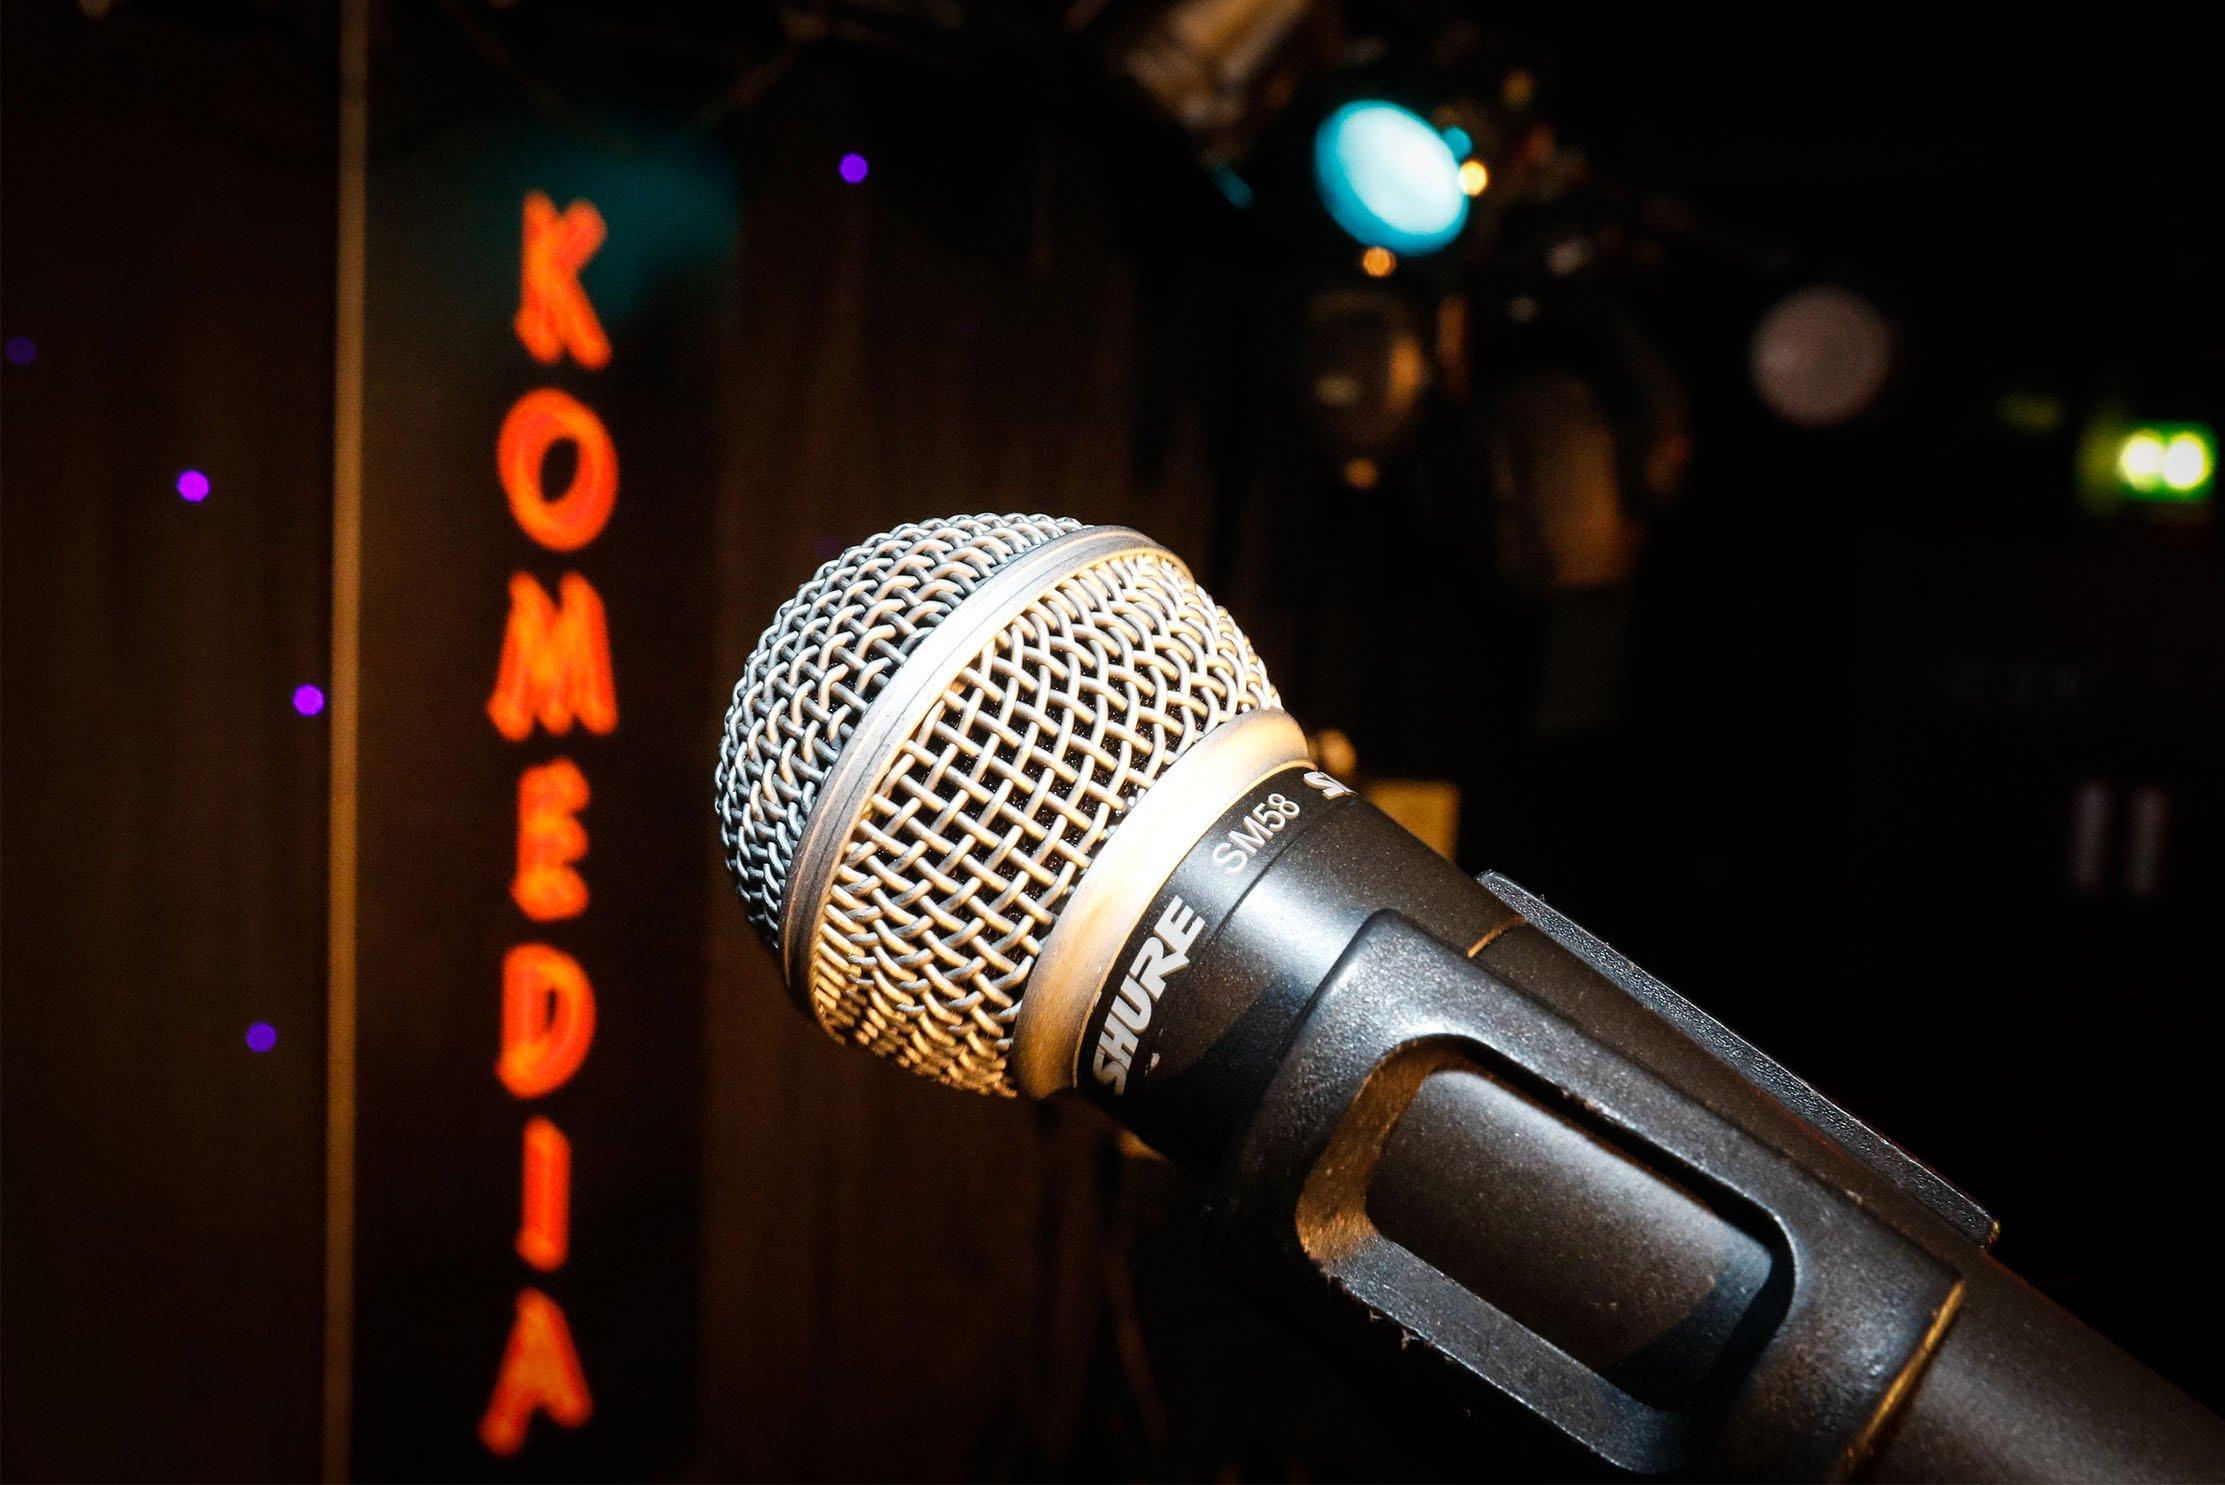 Komedia New comedy Award - (Credit Paul Mansfield)